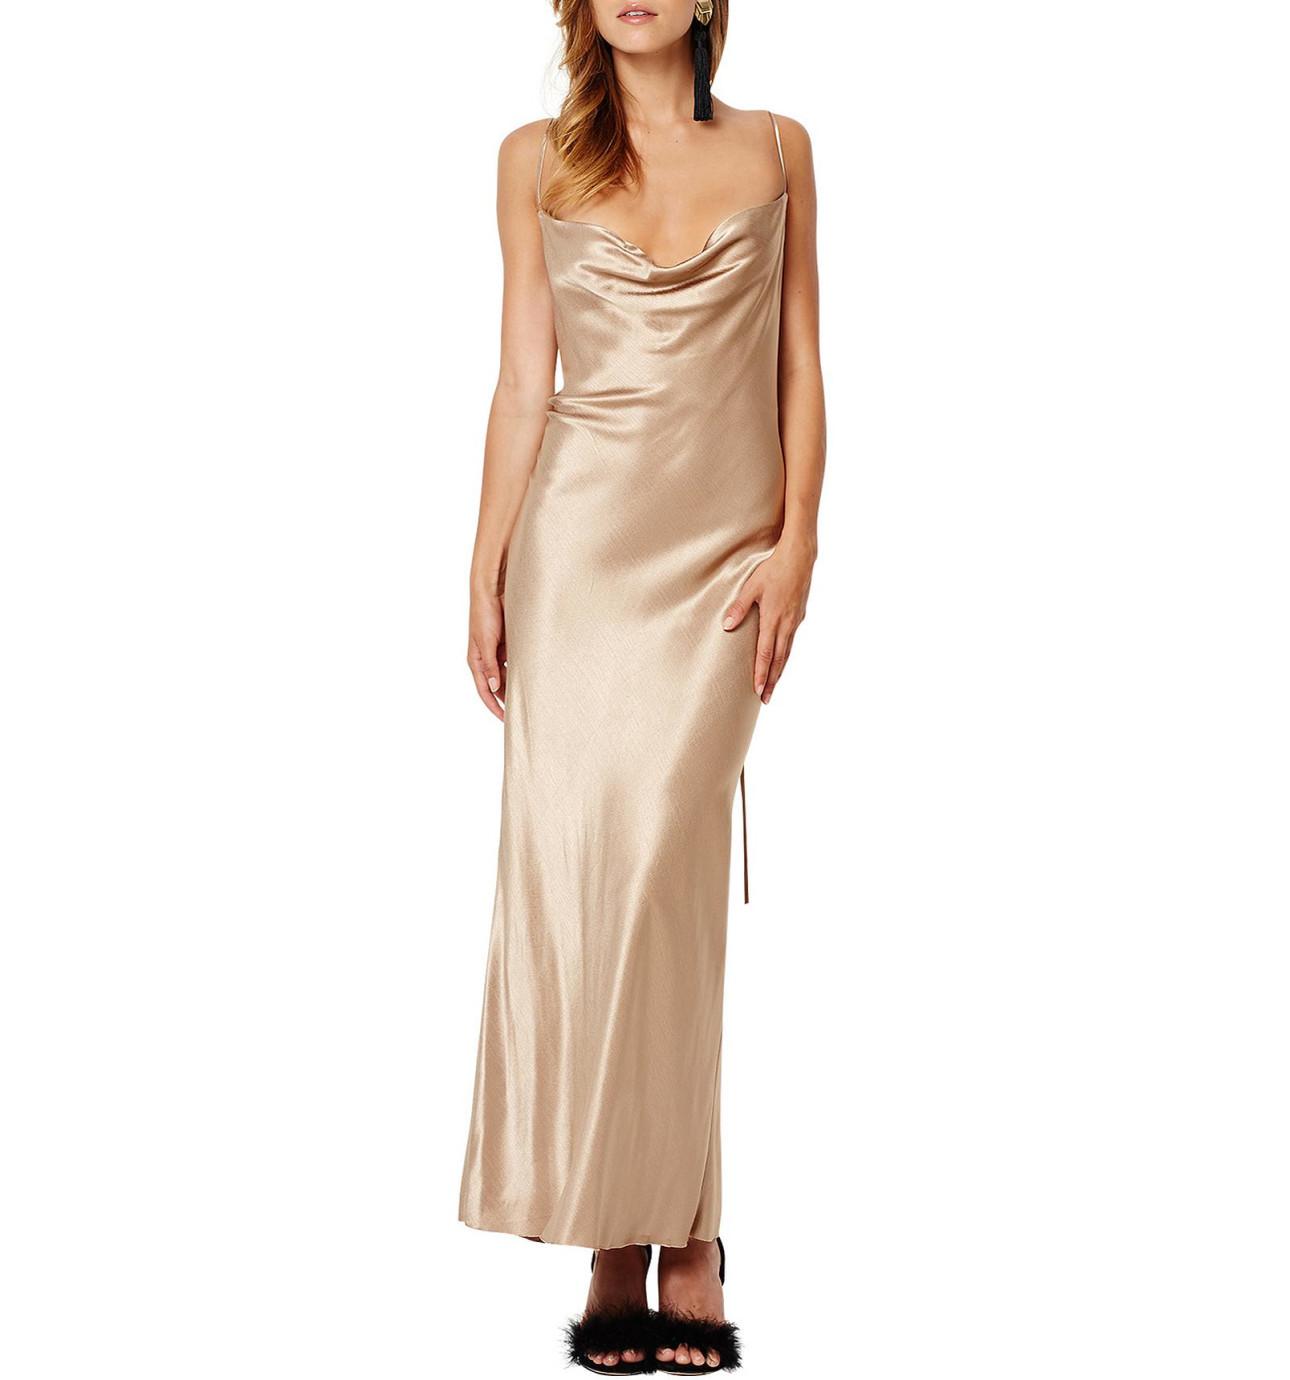 White dress david jones - Shimmy Nights Cowl Midi